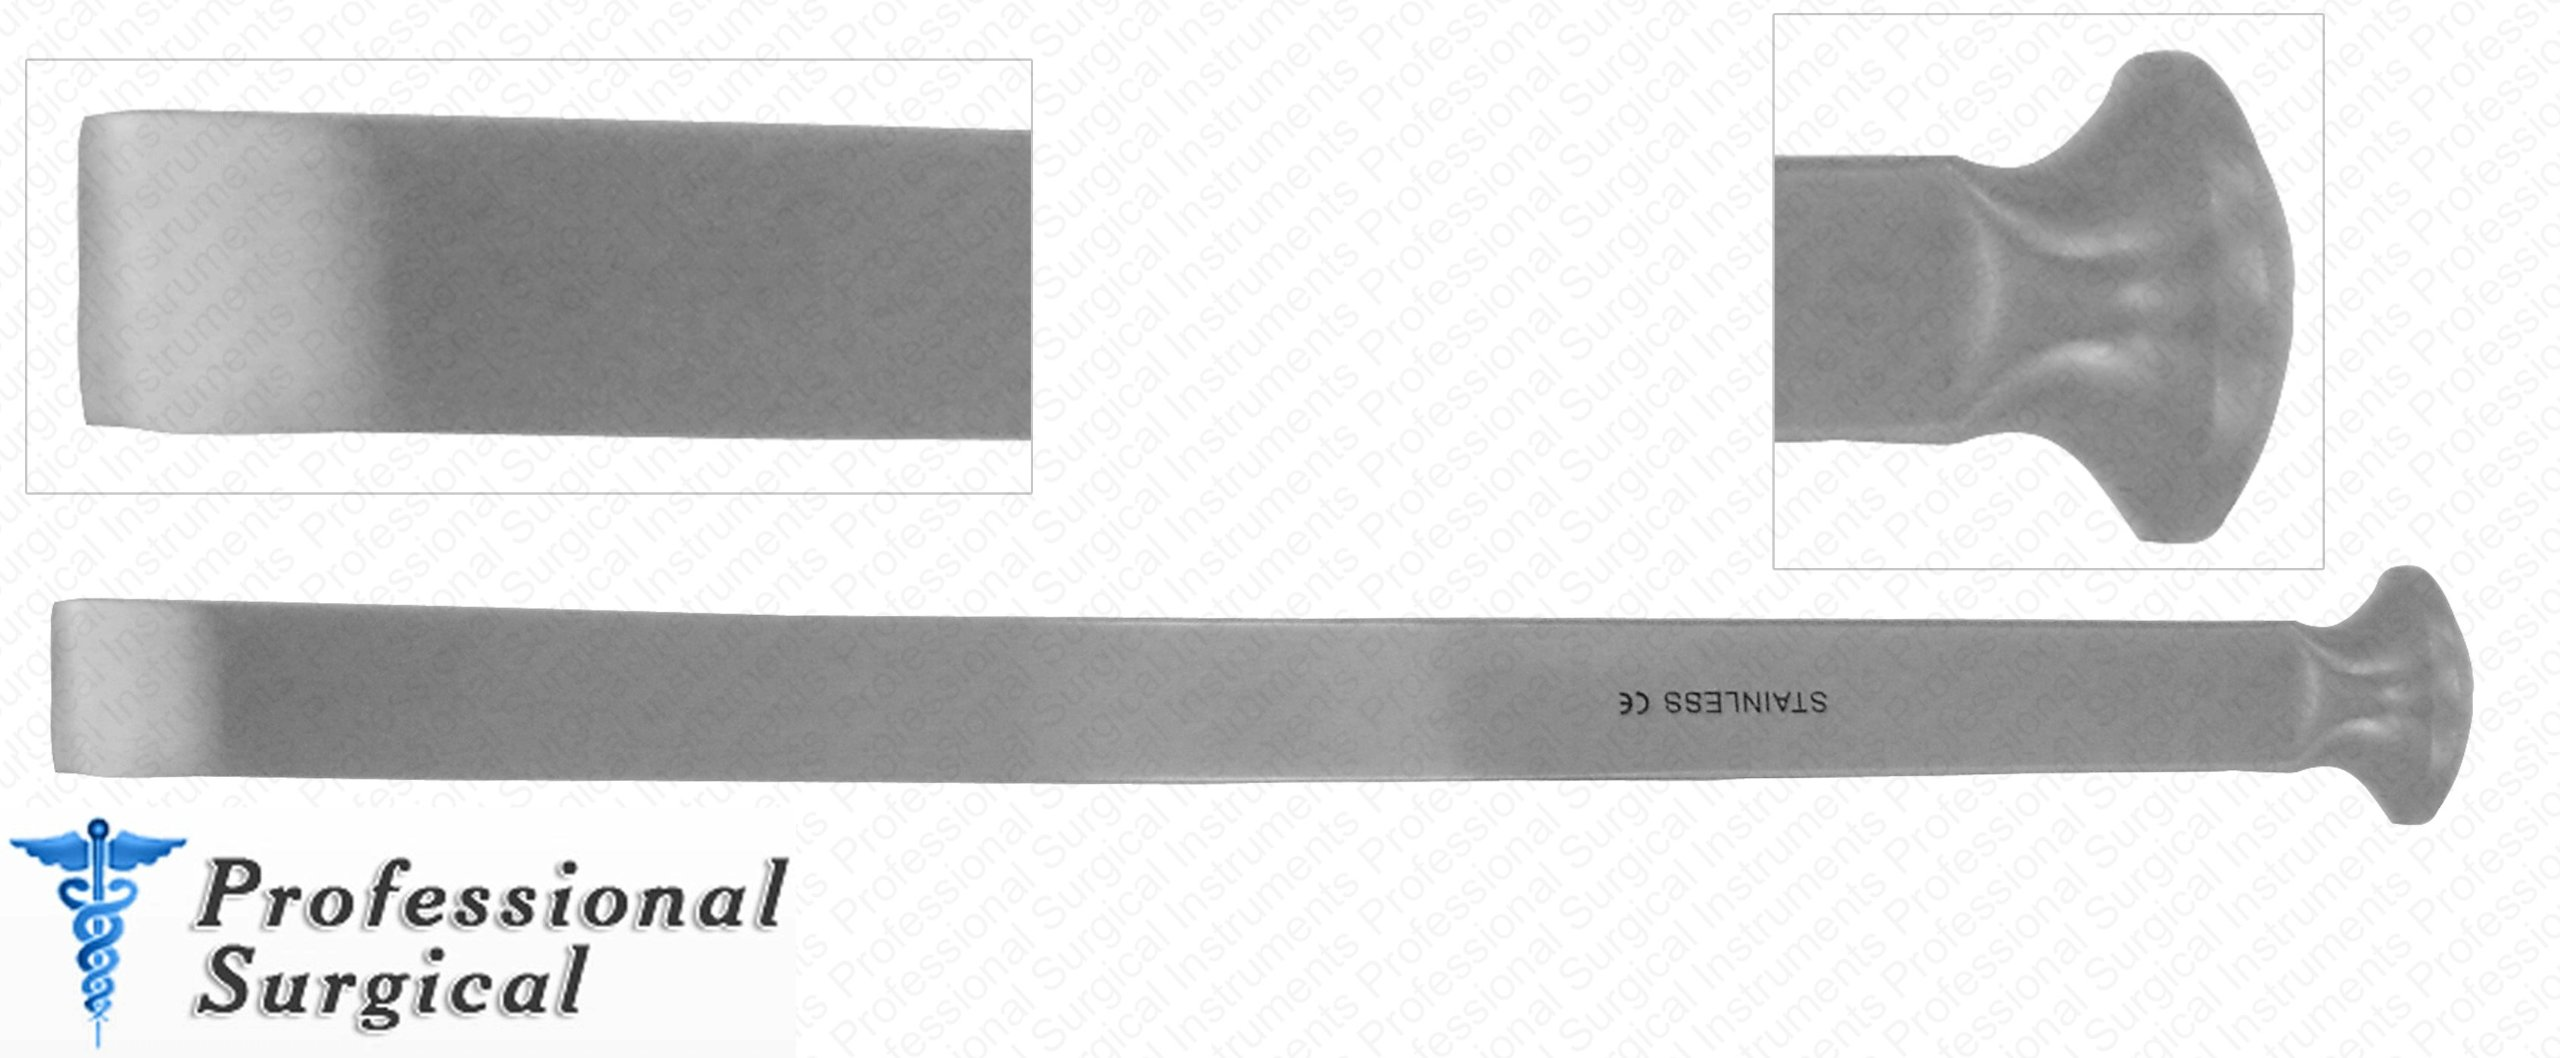 U.s.army Osteotomes 12mm